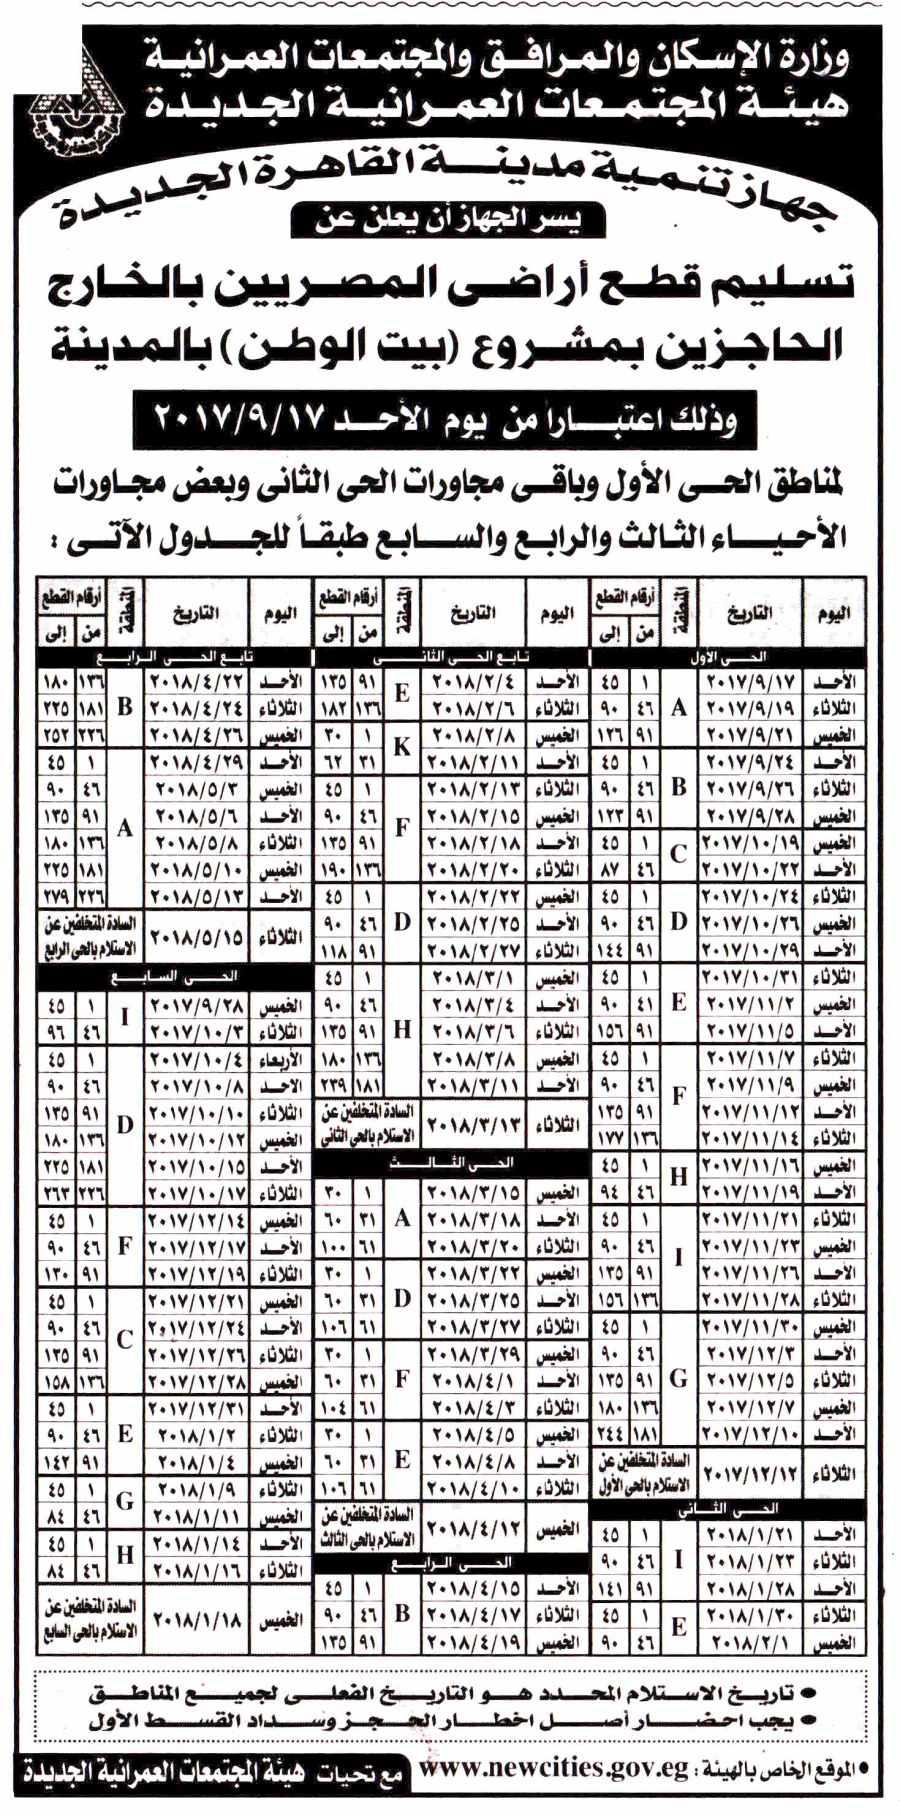 Al Ahram 29 Aug P.3.jpg